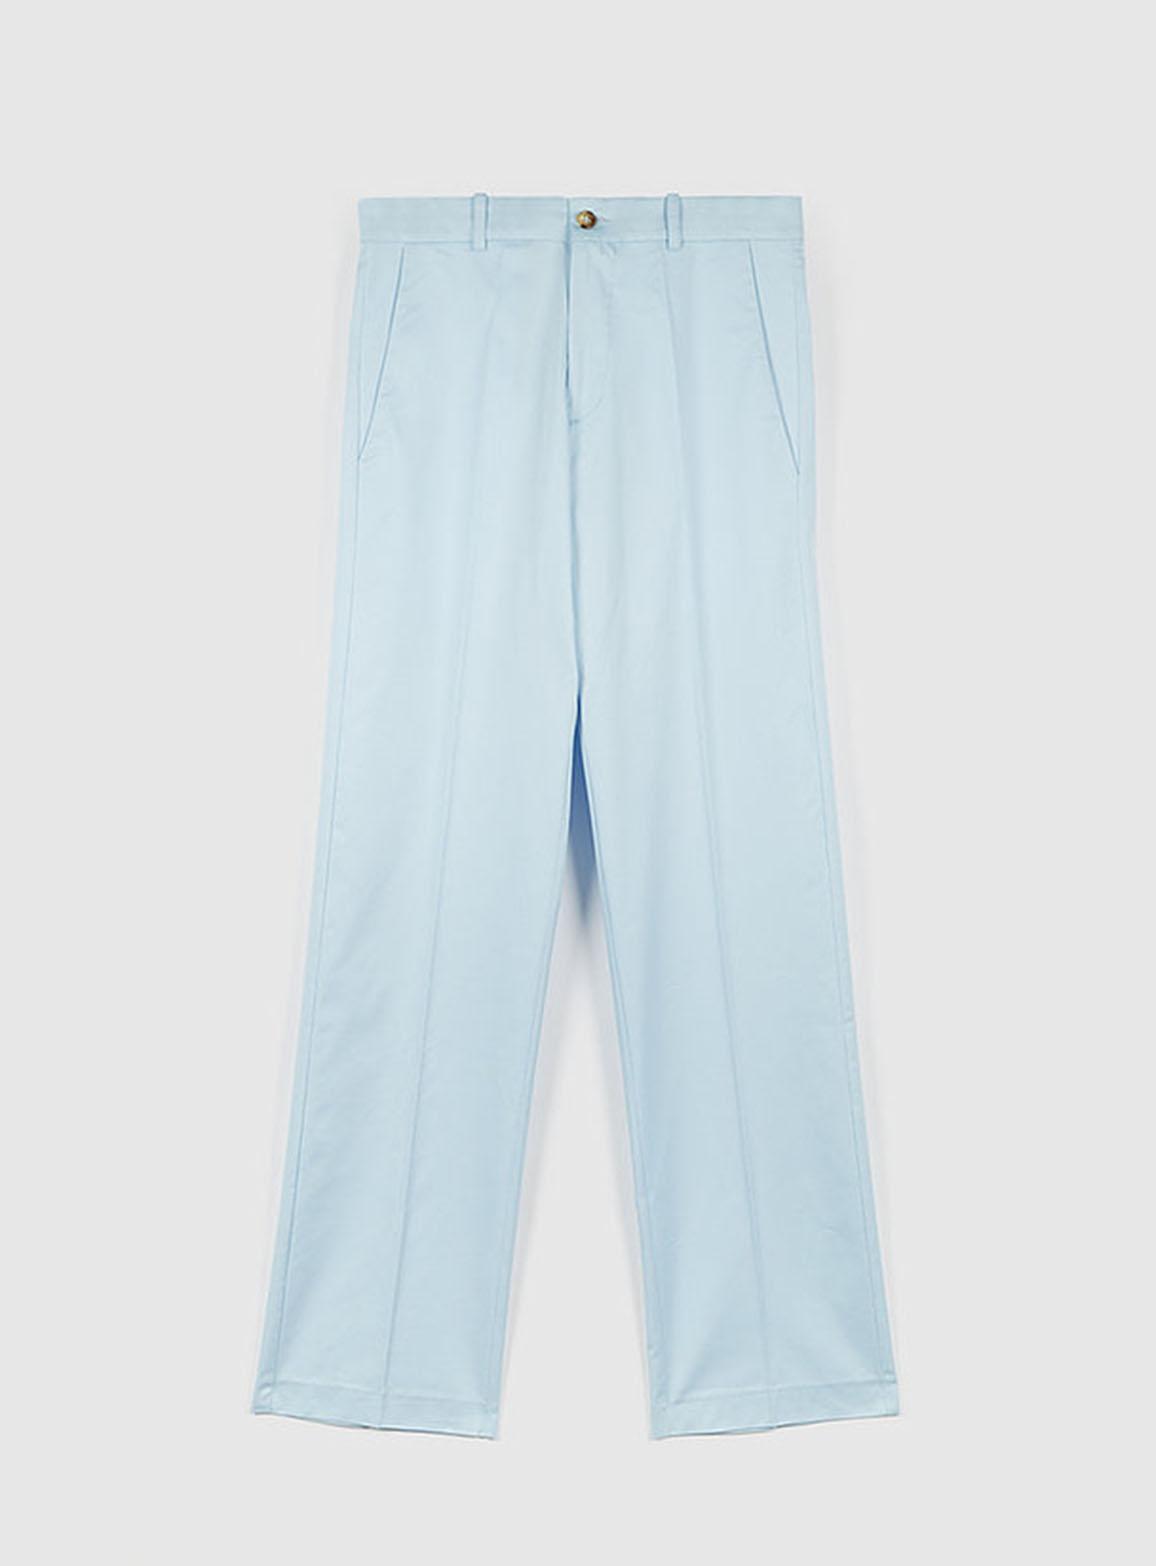 Fred blue pants